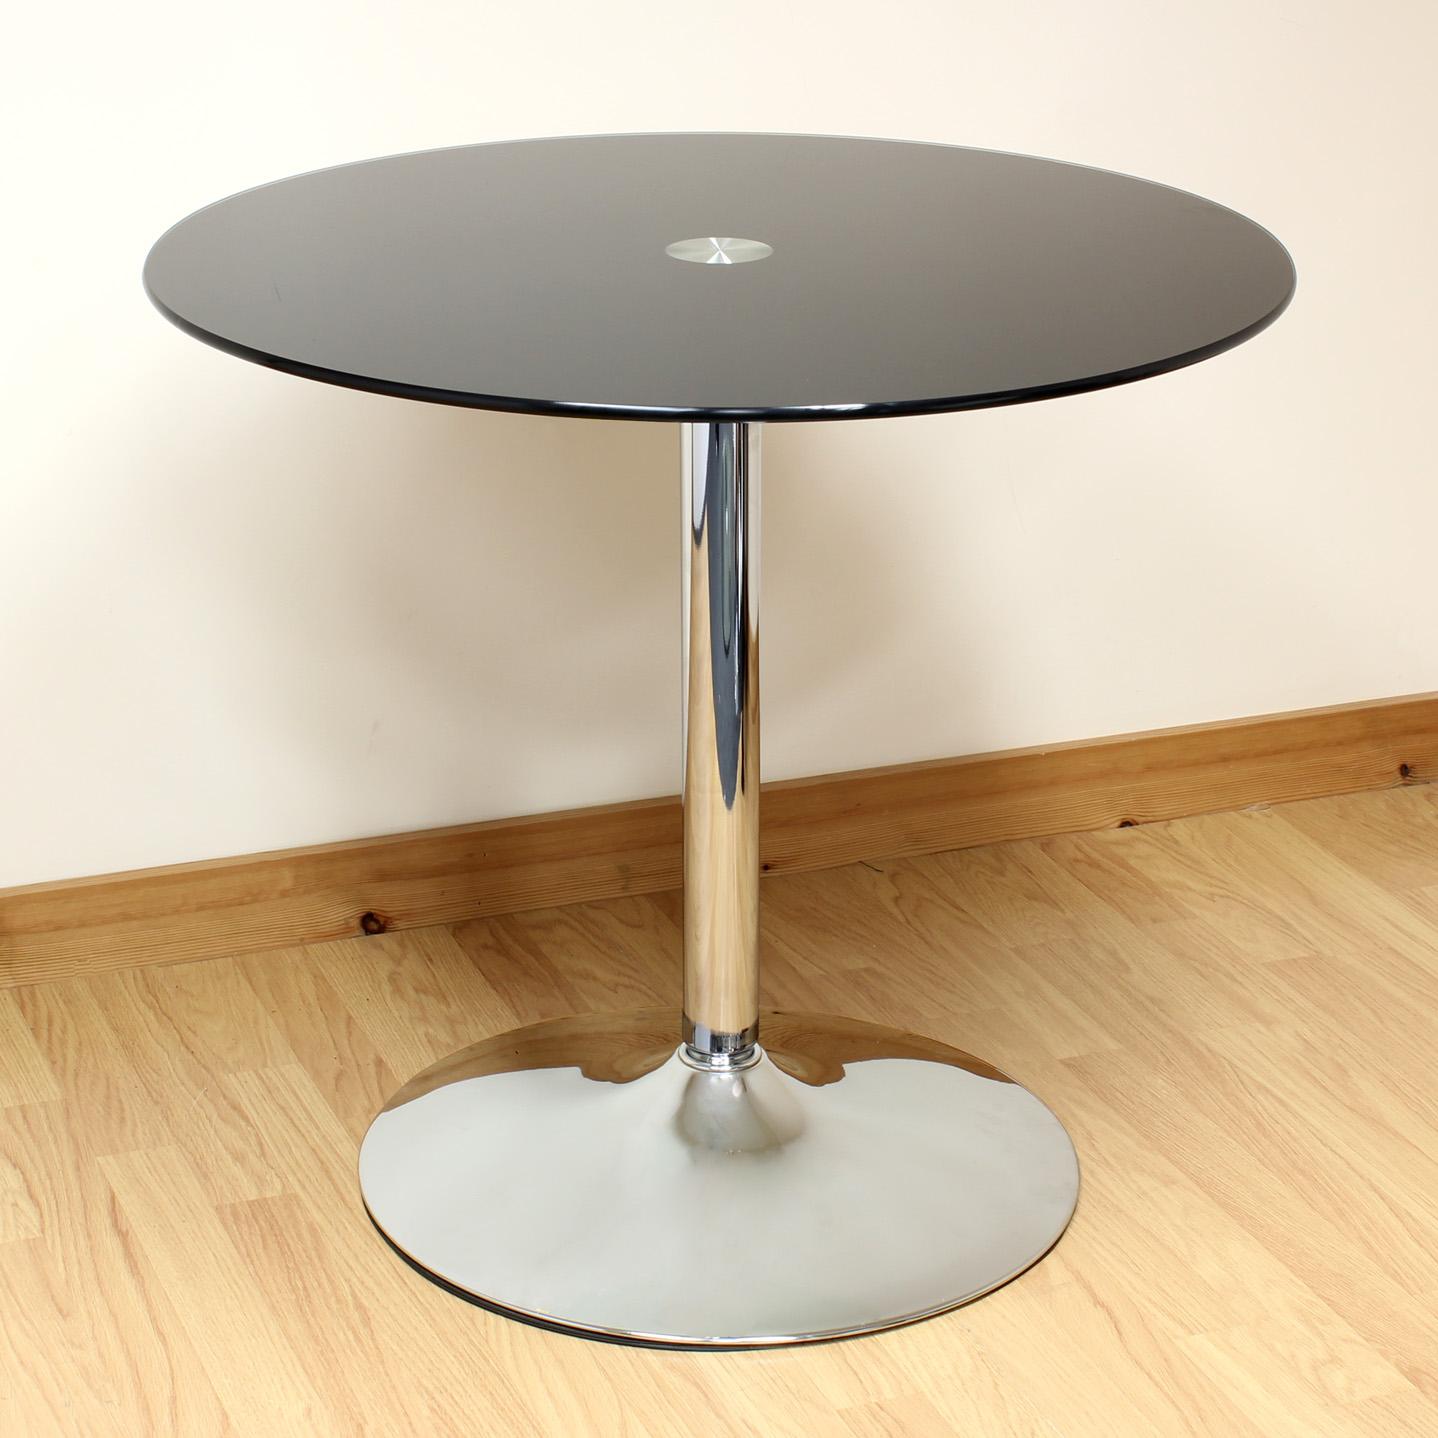 Round Glass Kitchen Table: Hartleys 80cm Black/Chrome Round Glass Dining/Kitchen Table Bistro/Cafe Style